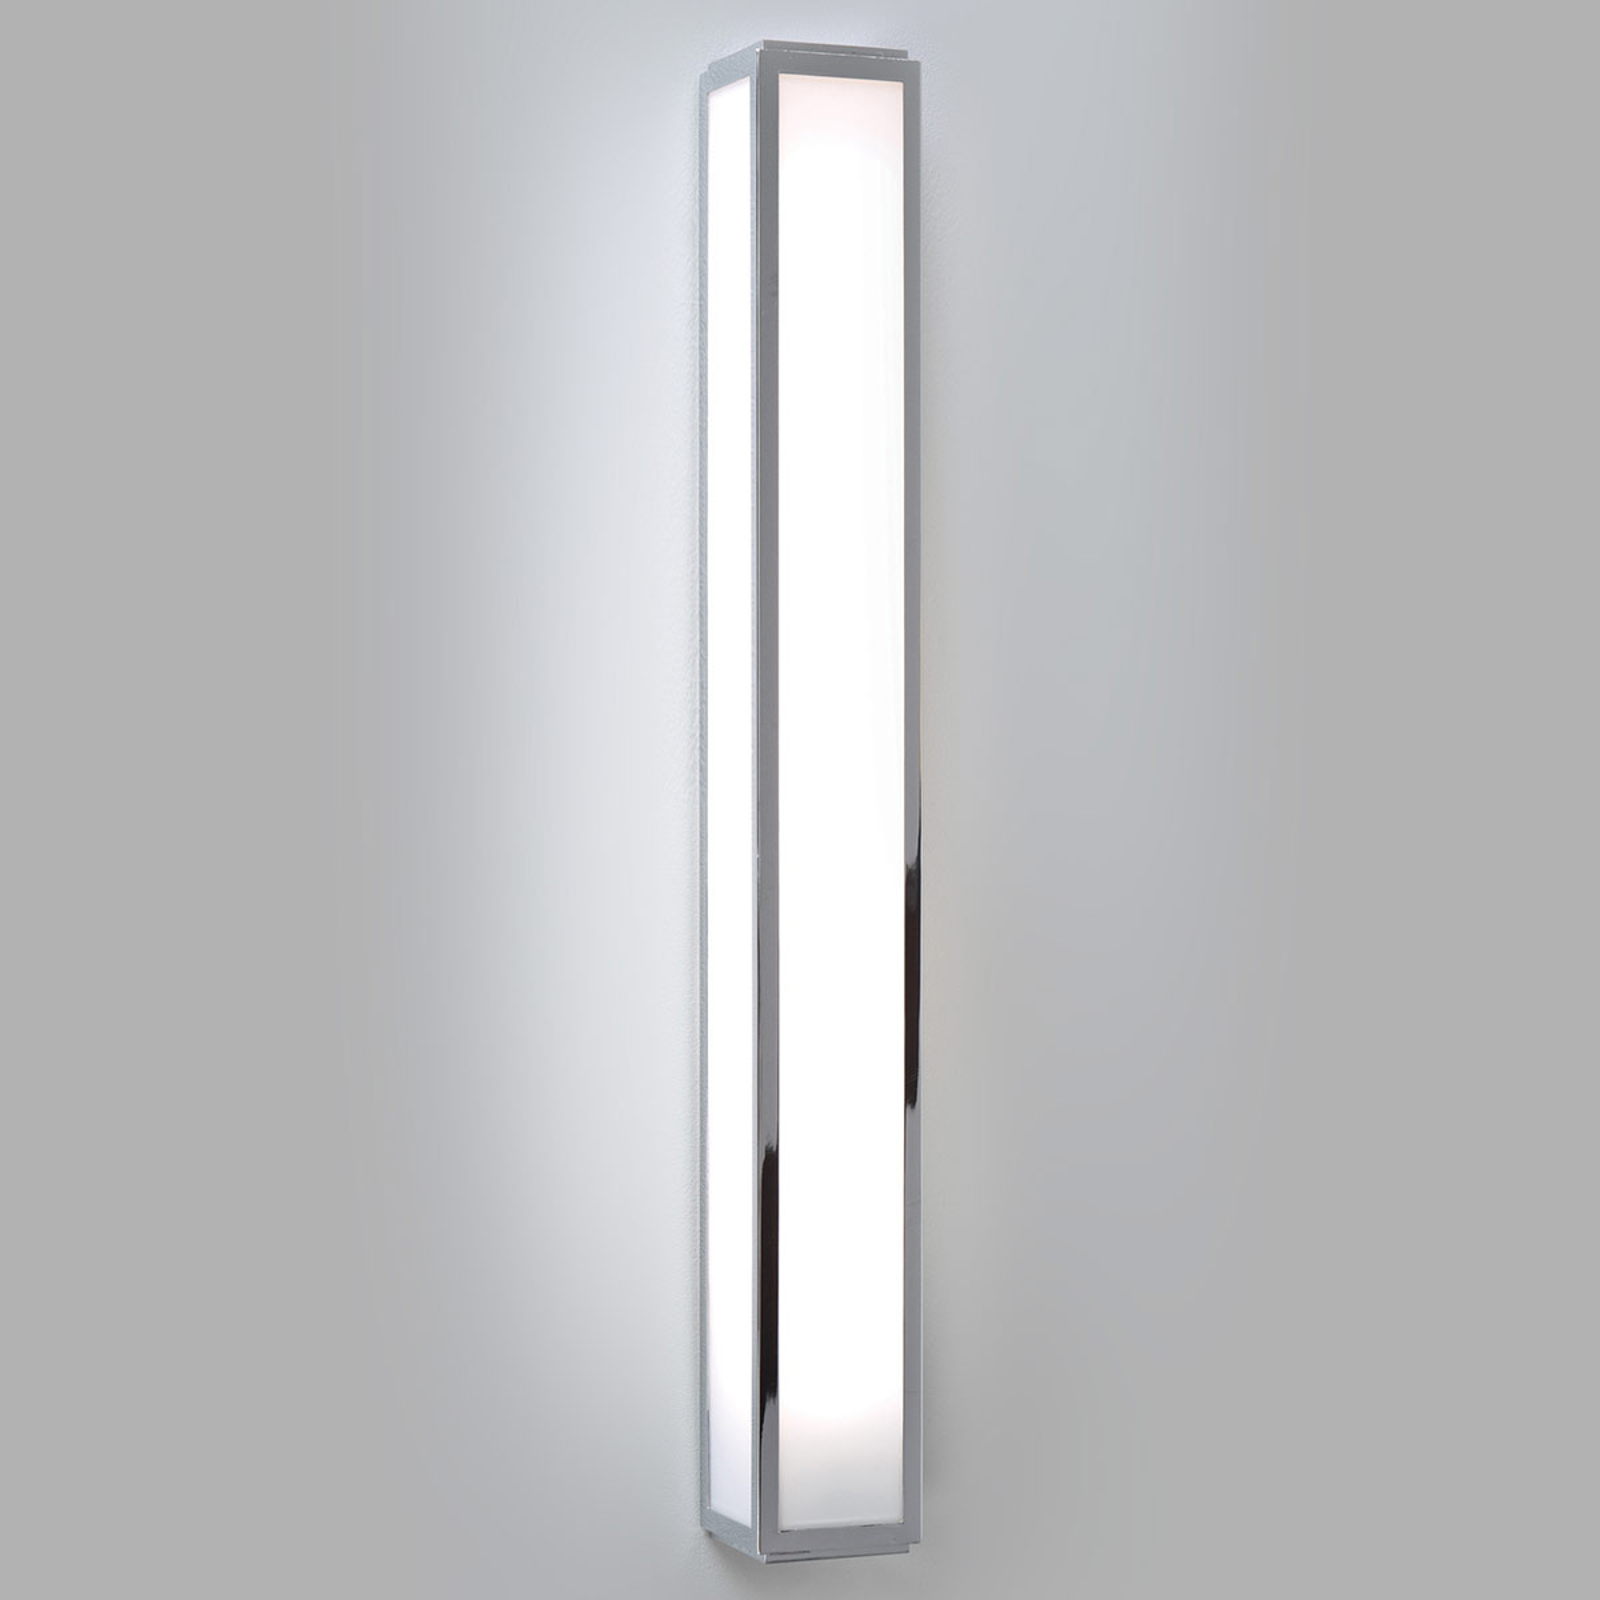 Podłużna lampa ścienna LED MASHIKO 600 LED